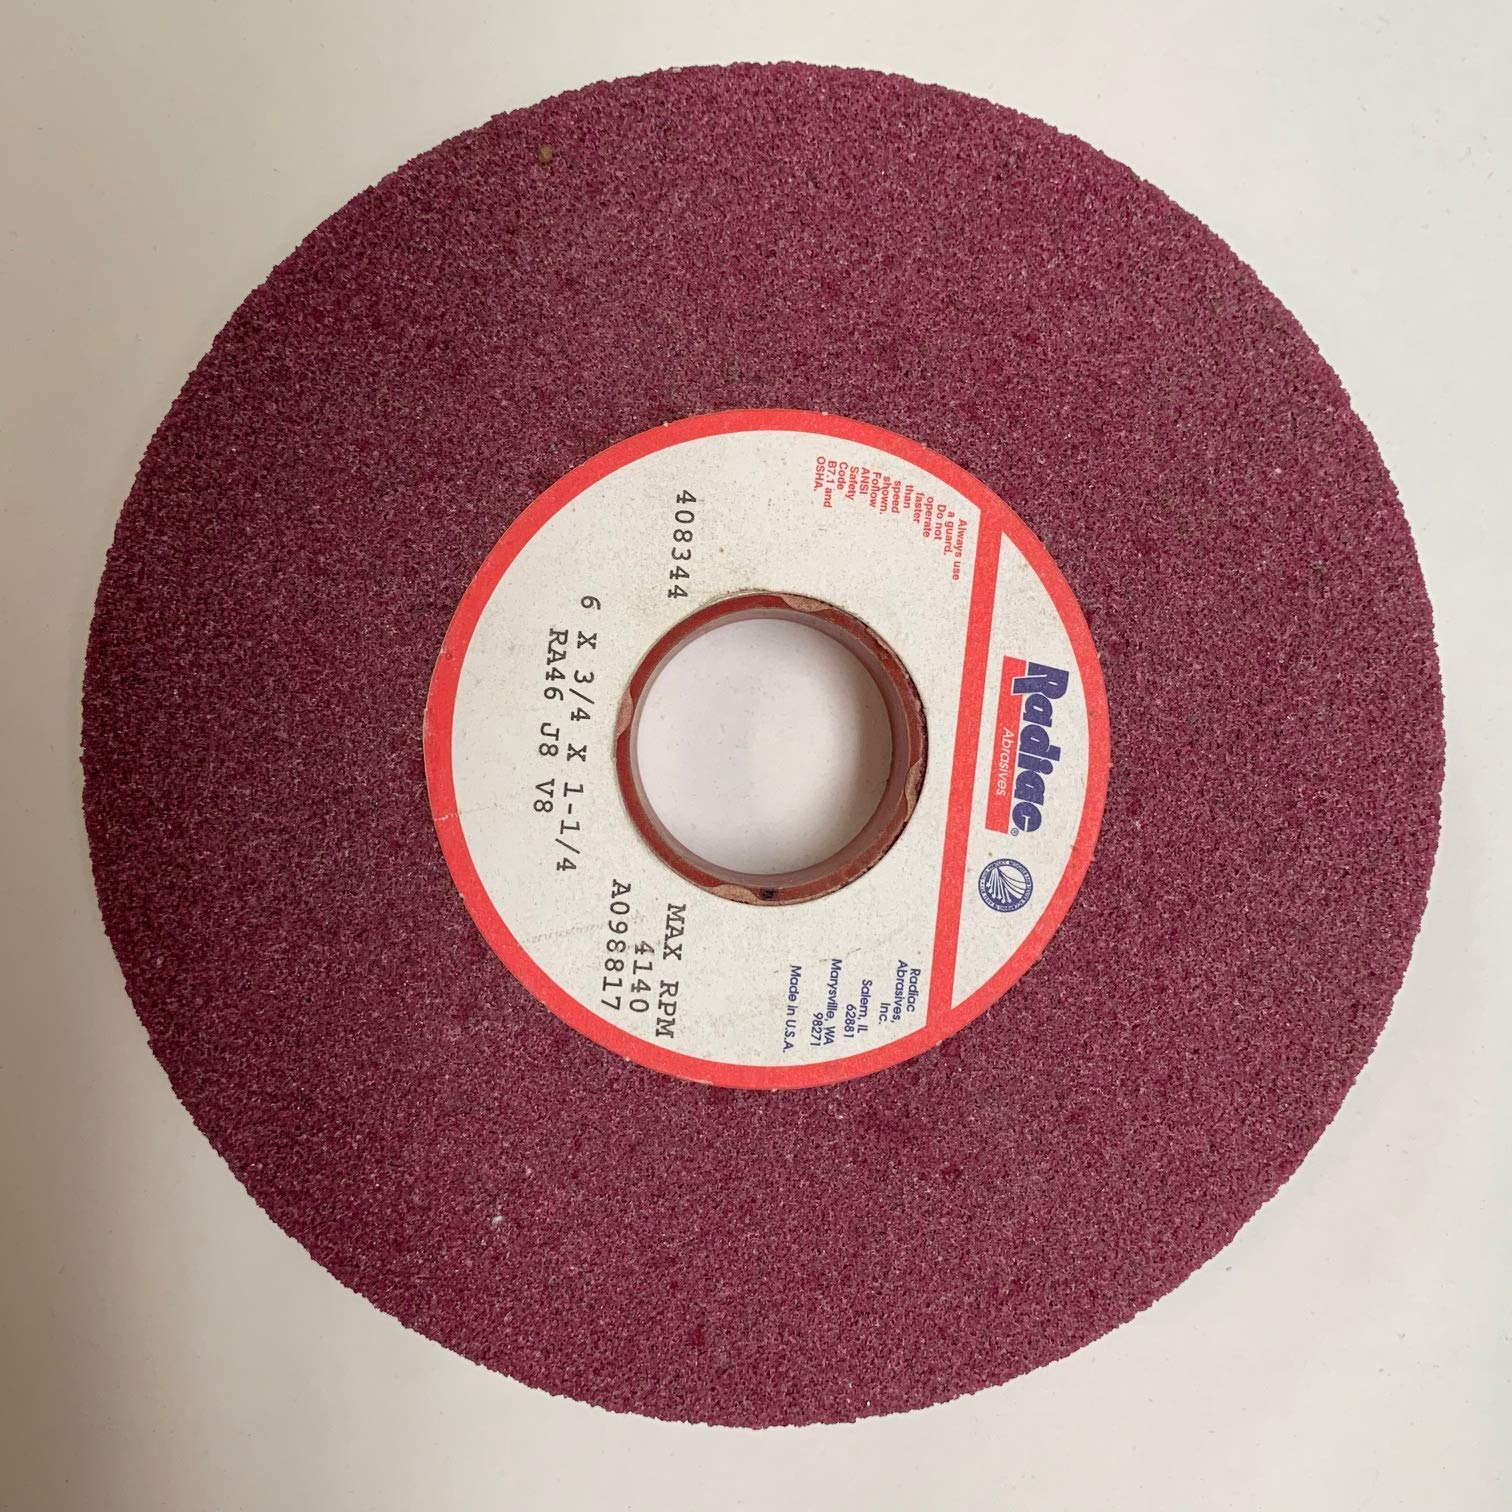 6 x 3/4 x 1-1/4 RA46 J8 V8 RADIAC Ruby RED Grinding Wheel